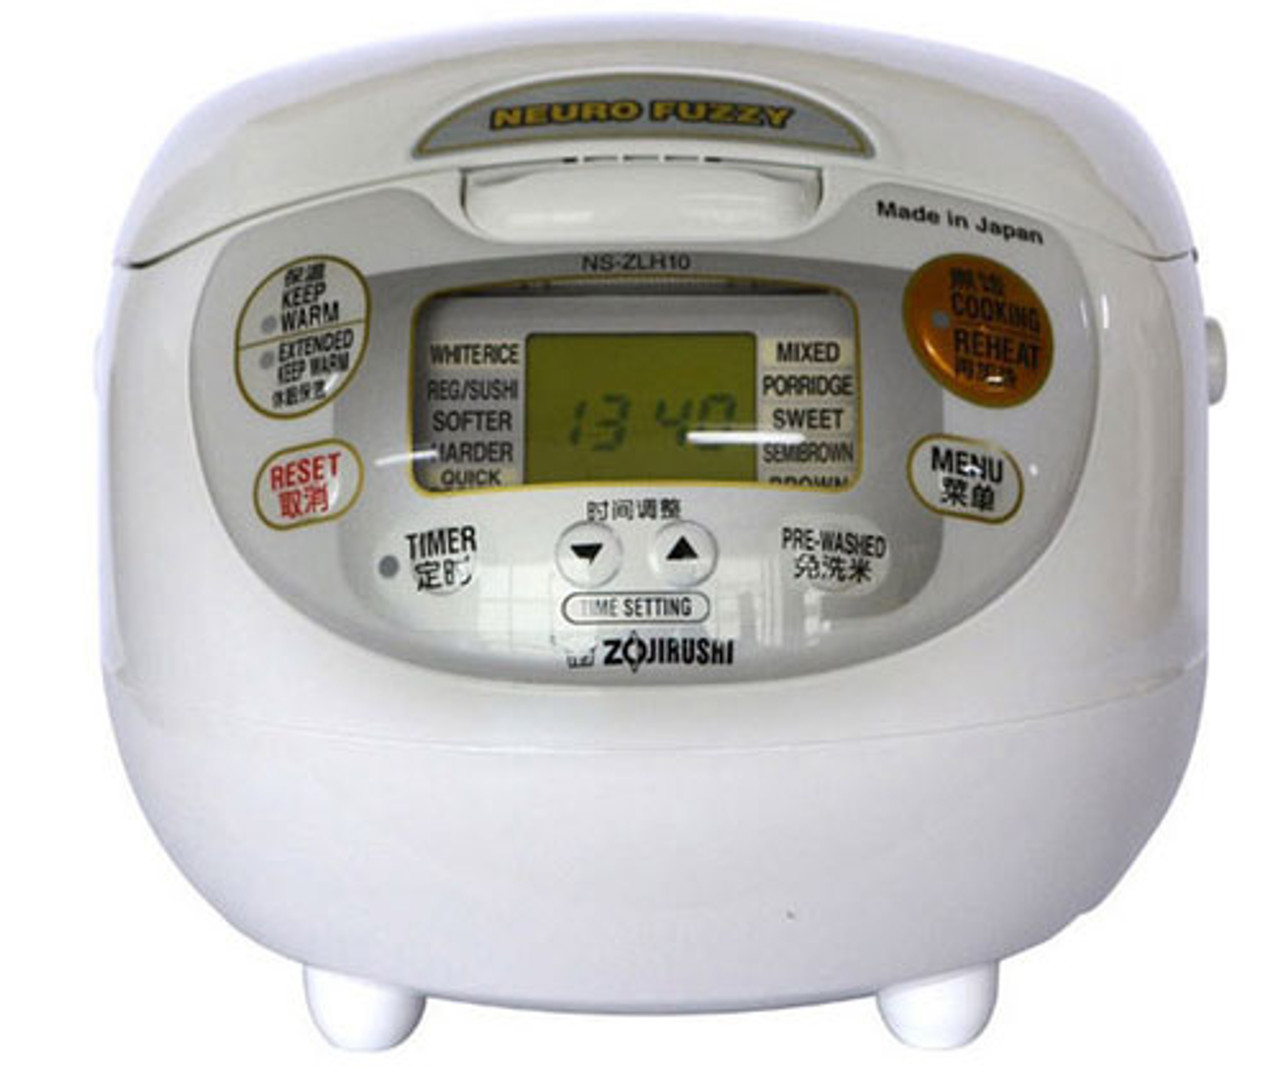 Zojirushi Rice Cooker NS-ZLH10 WZ 220-230V